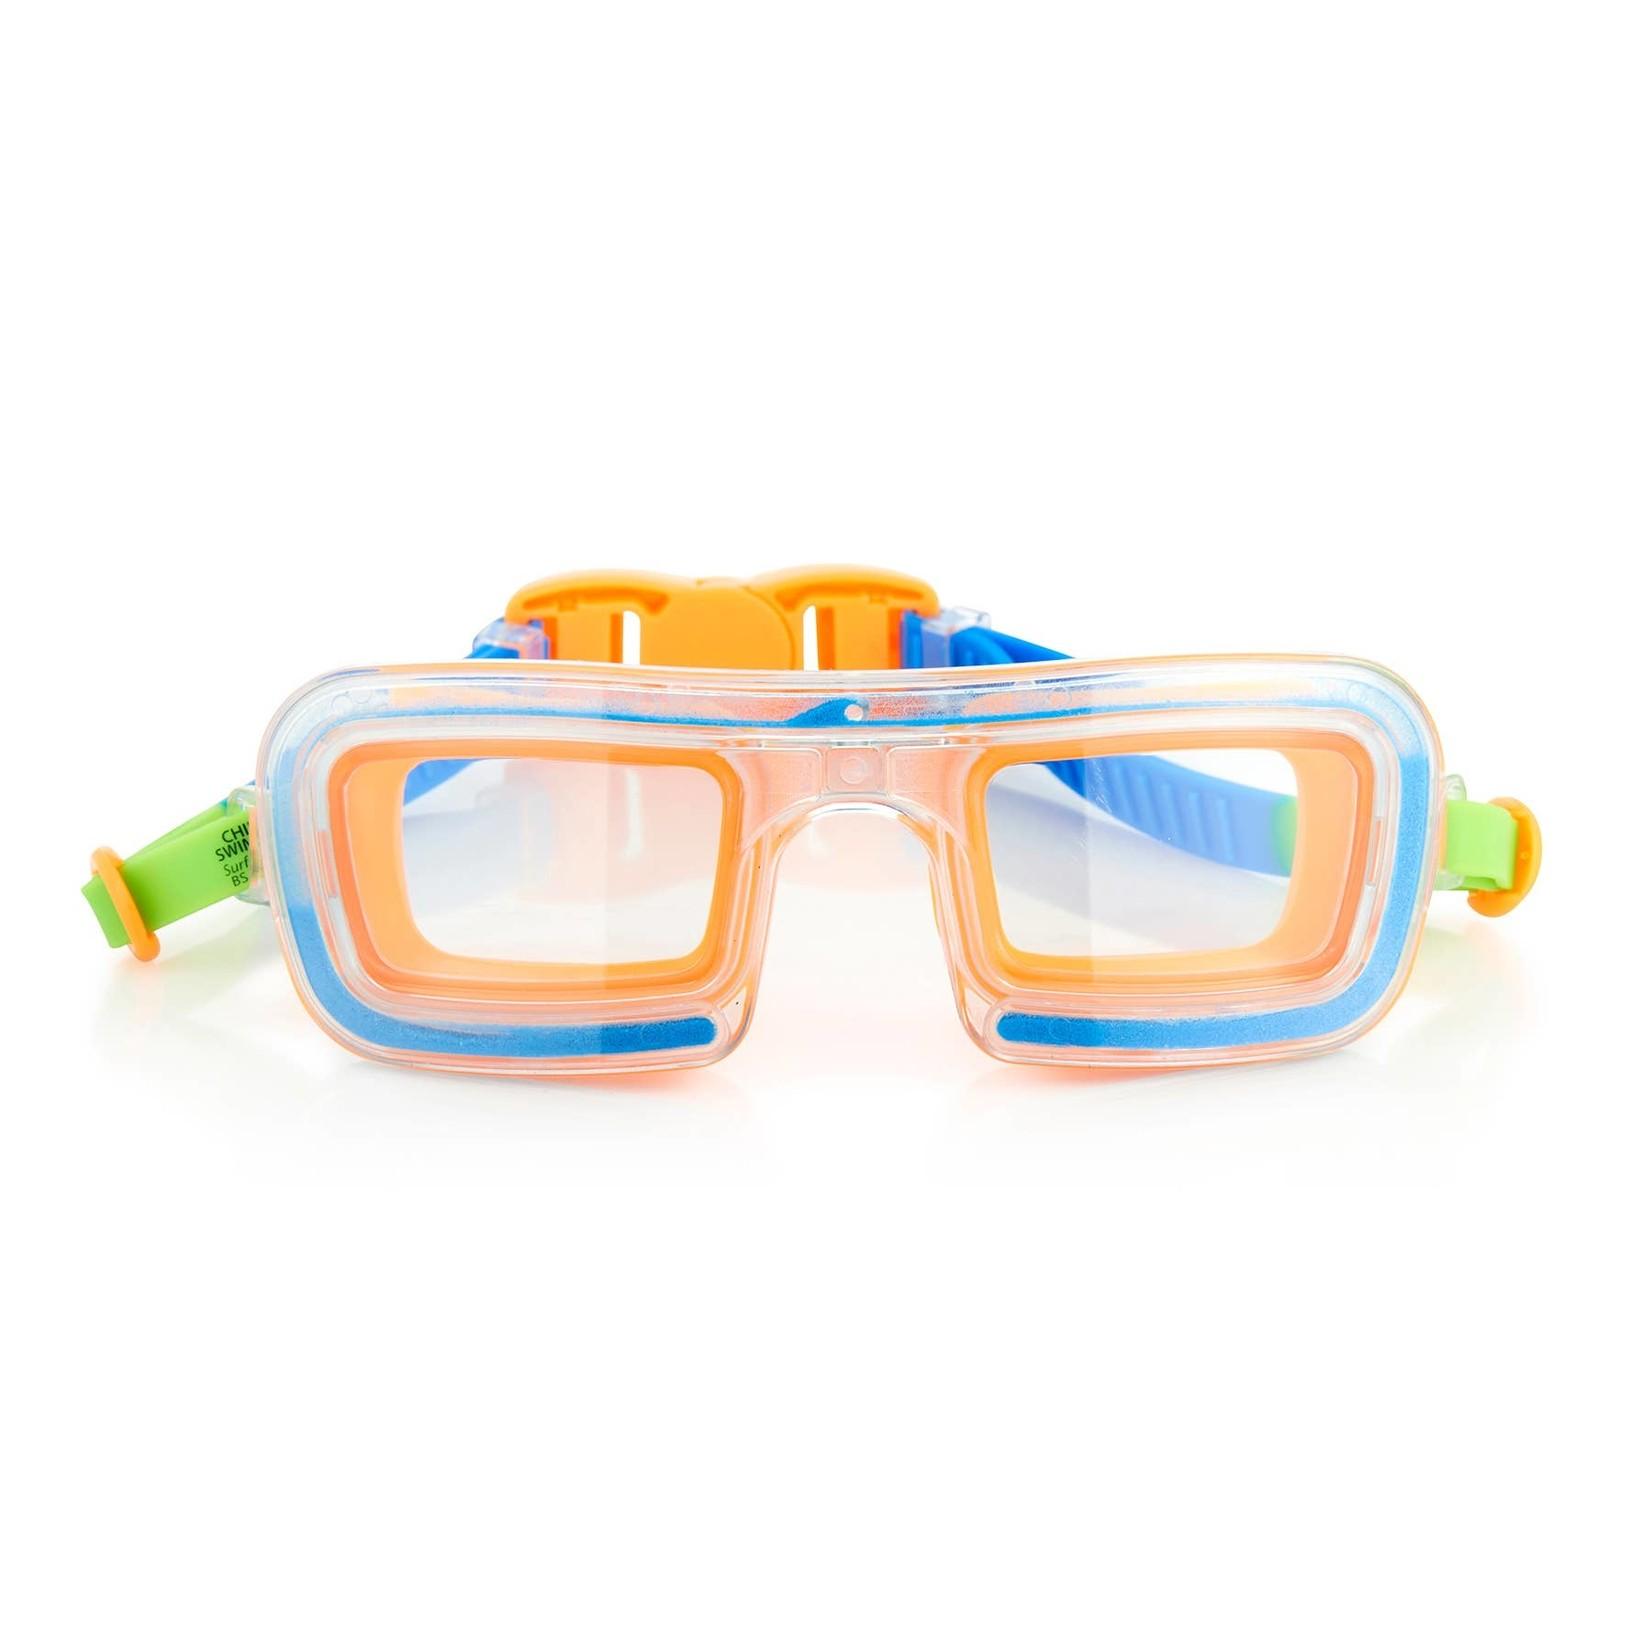 Mr. Sandman Goggles